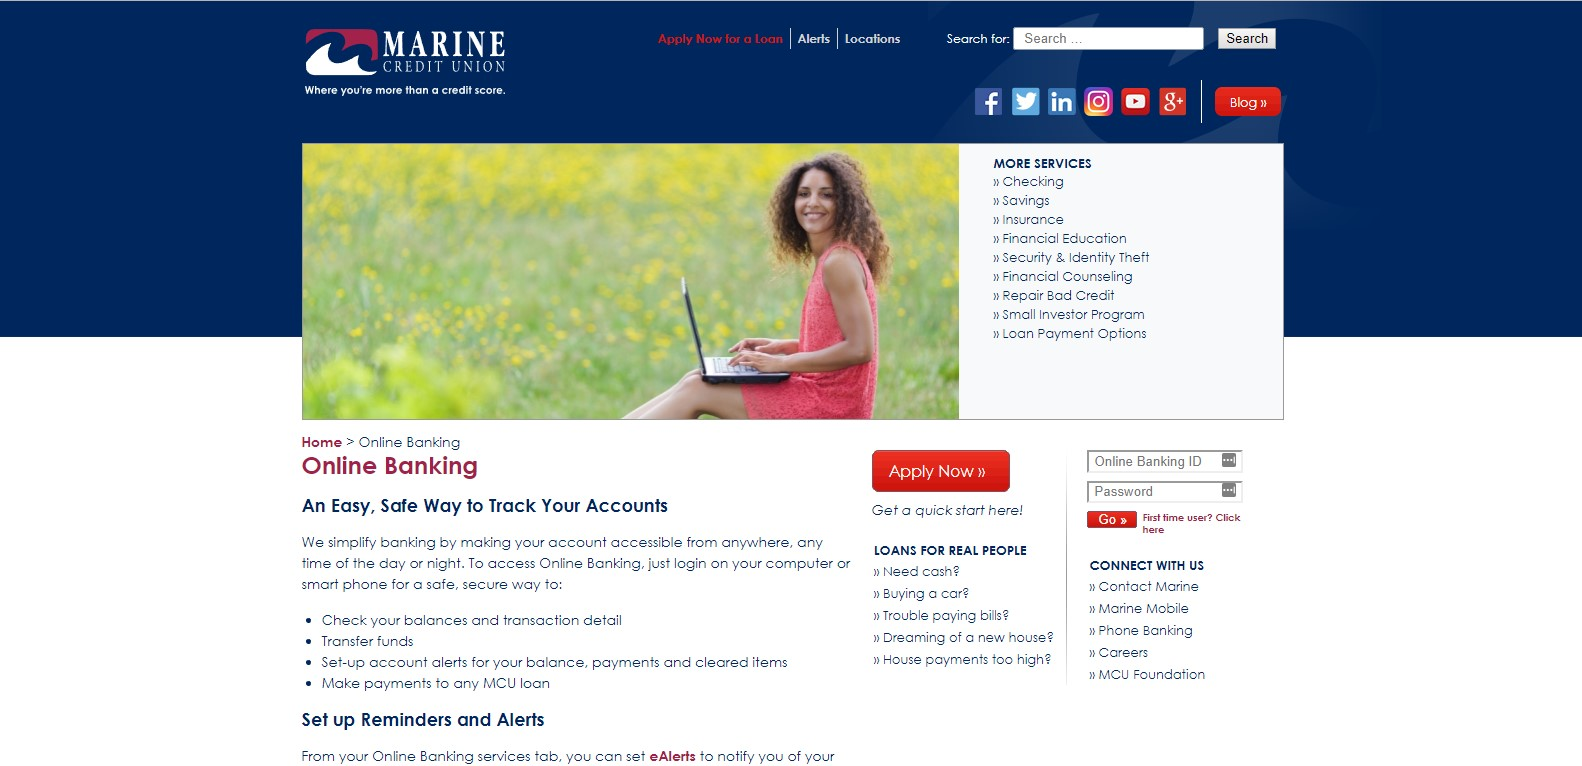 marine credit union online banking